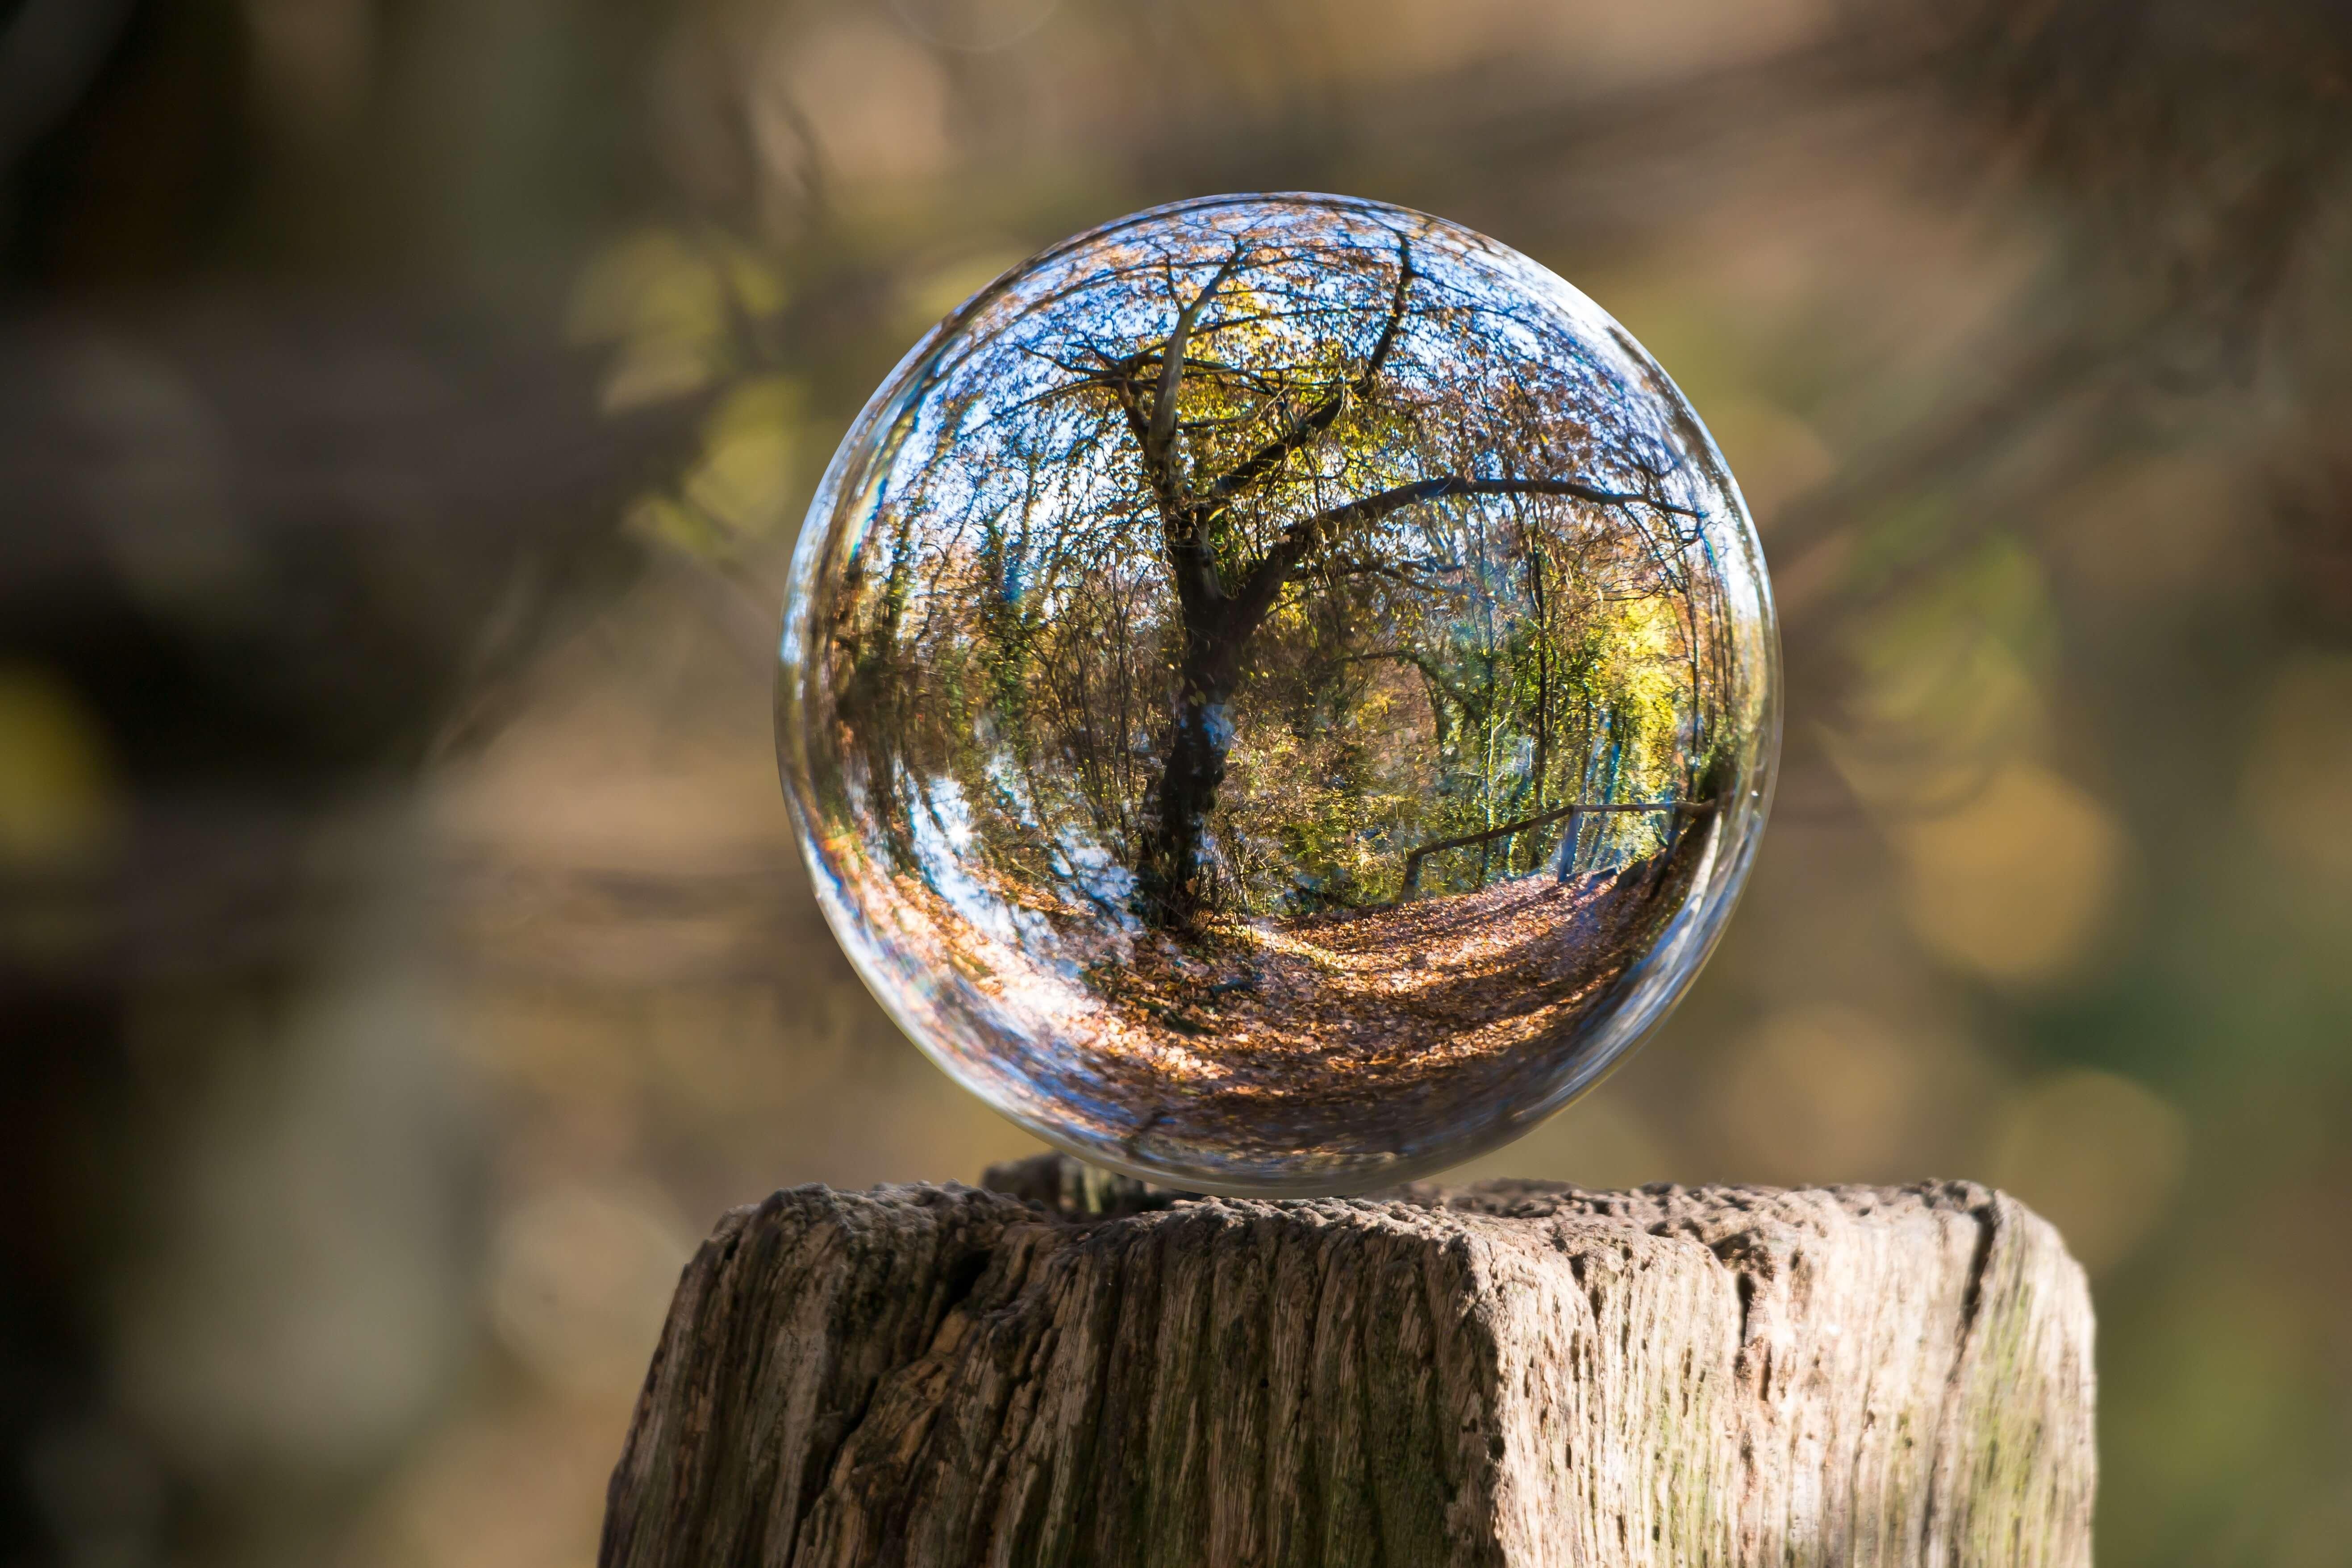 water-drop-ball-tree